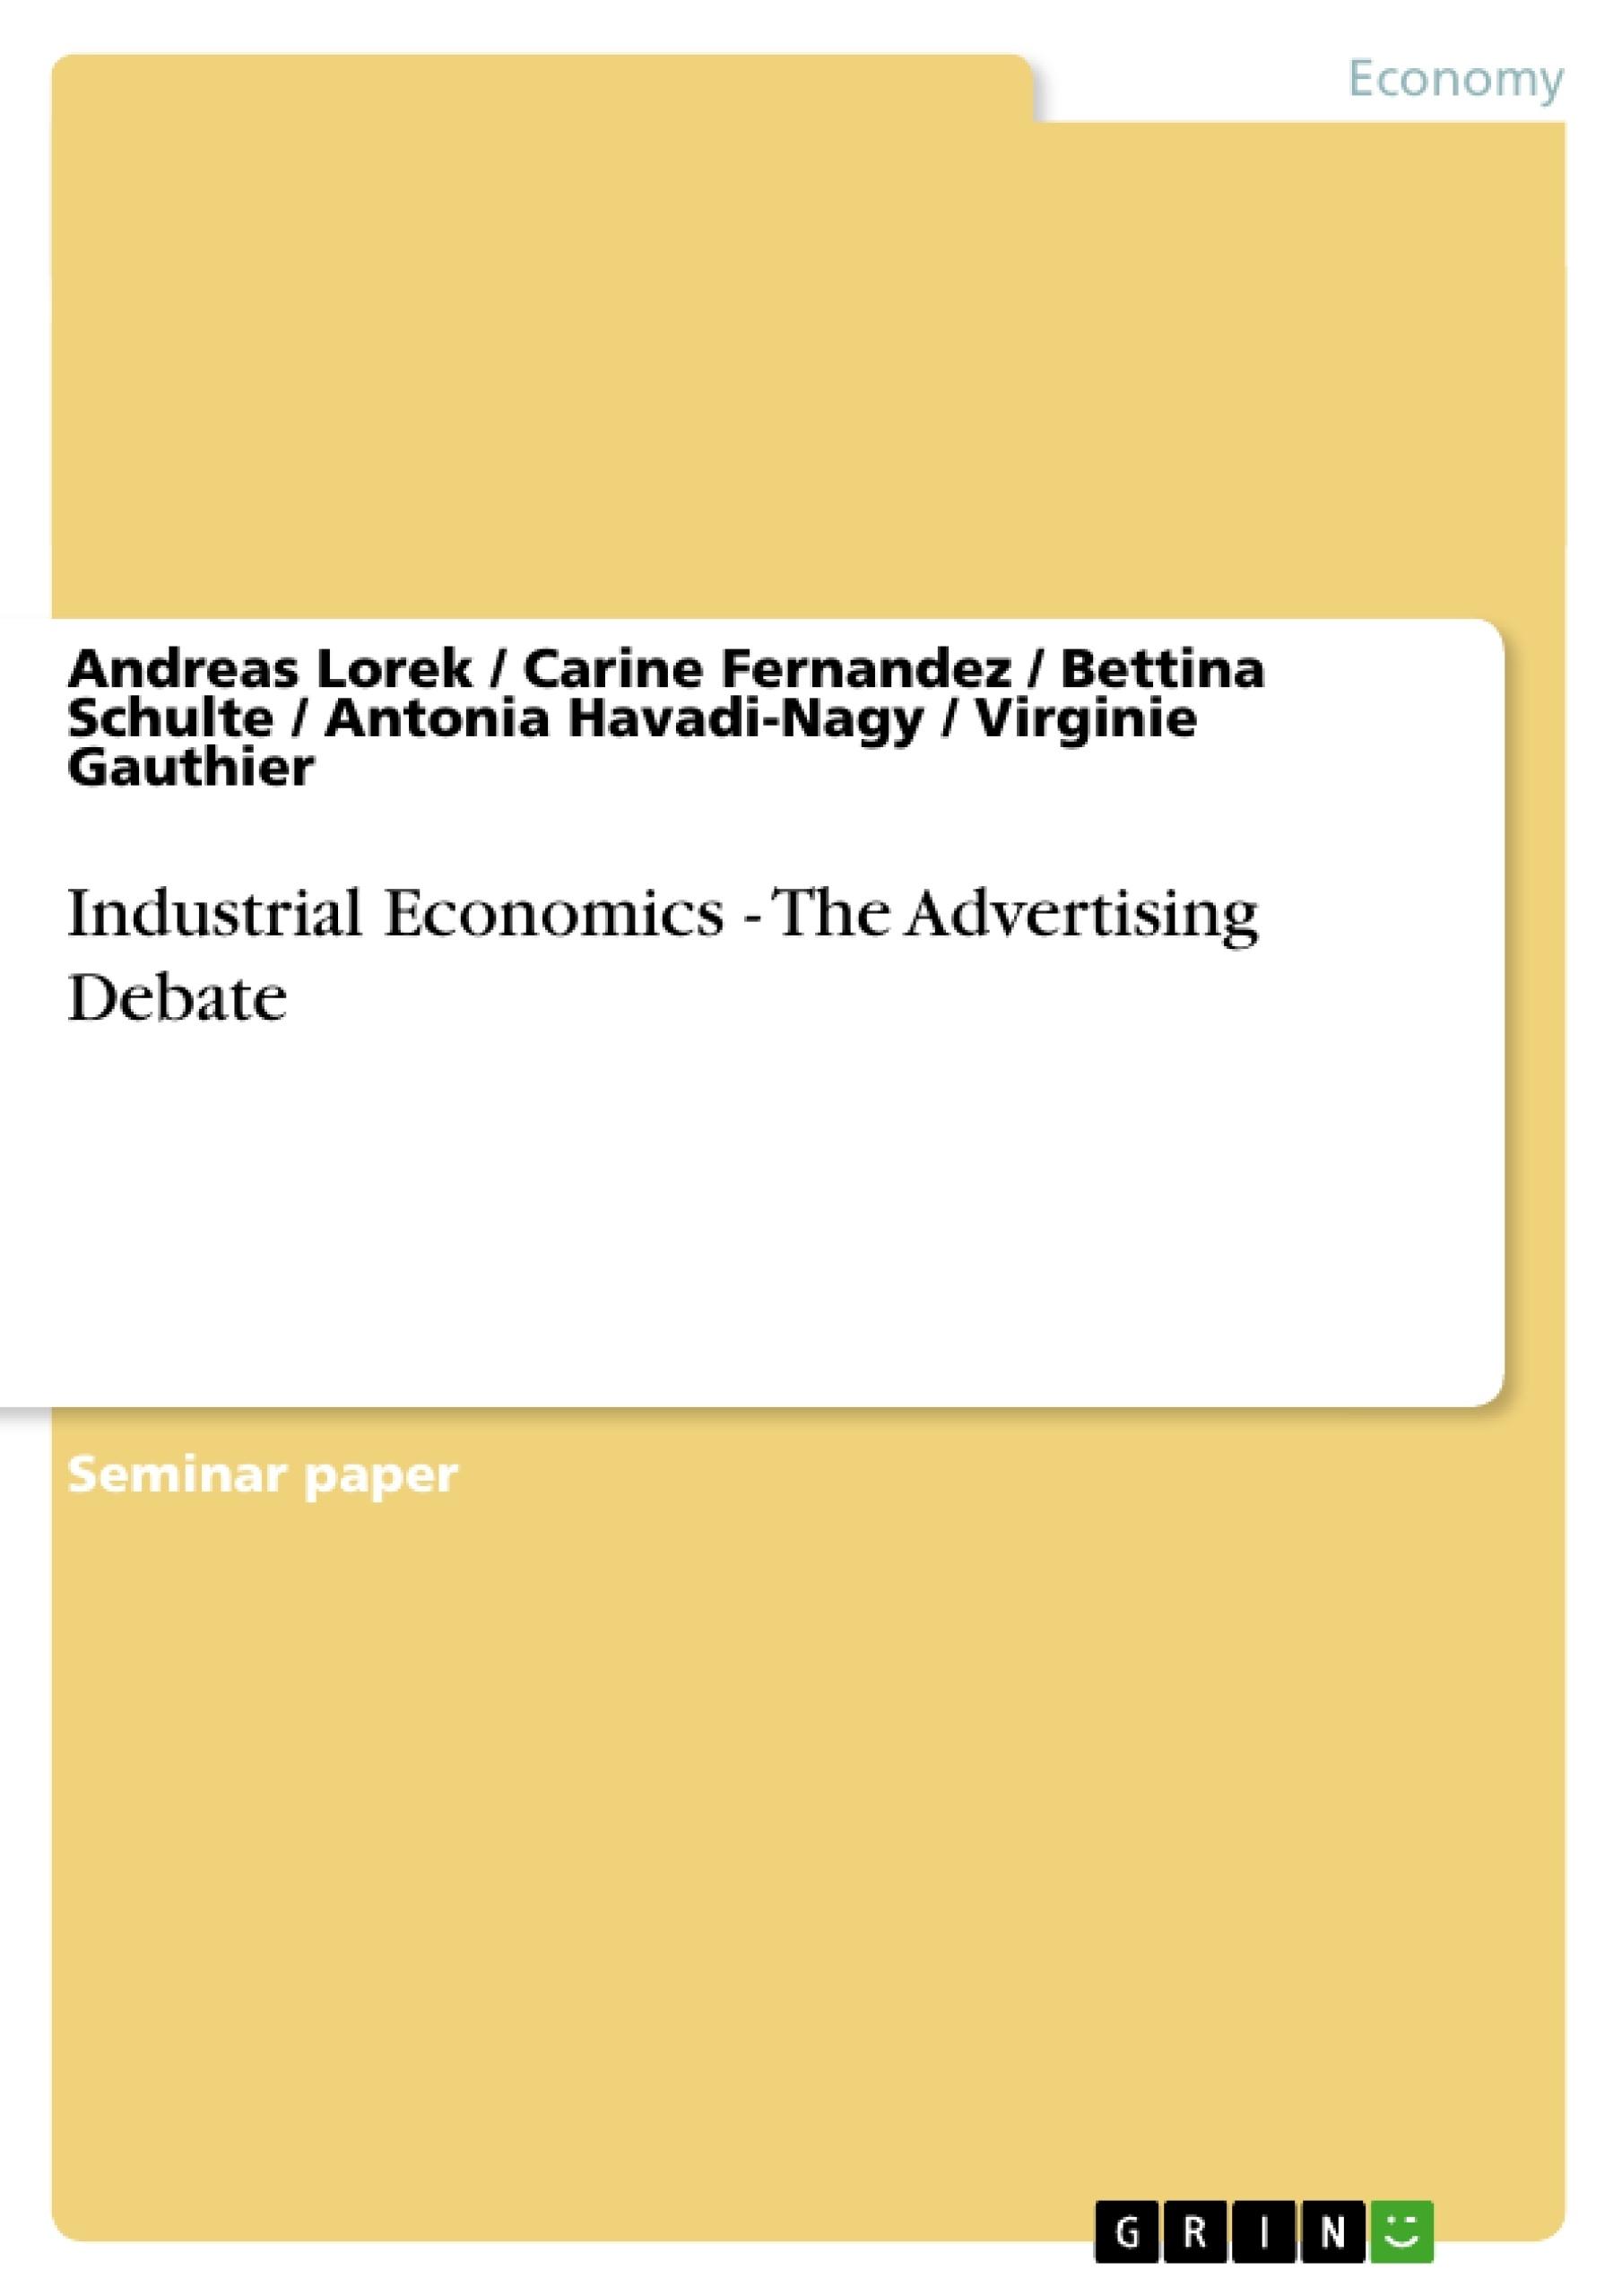 Title: Industrial Economics - The Advertising Debate